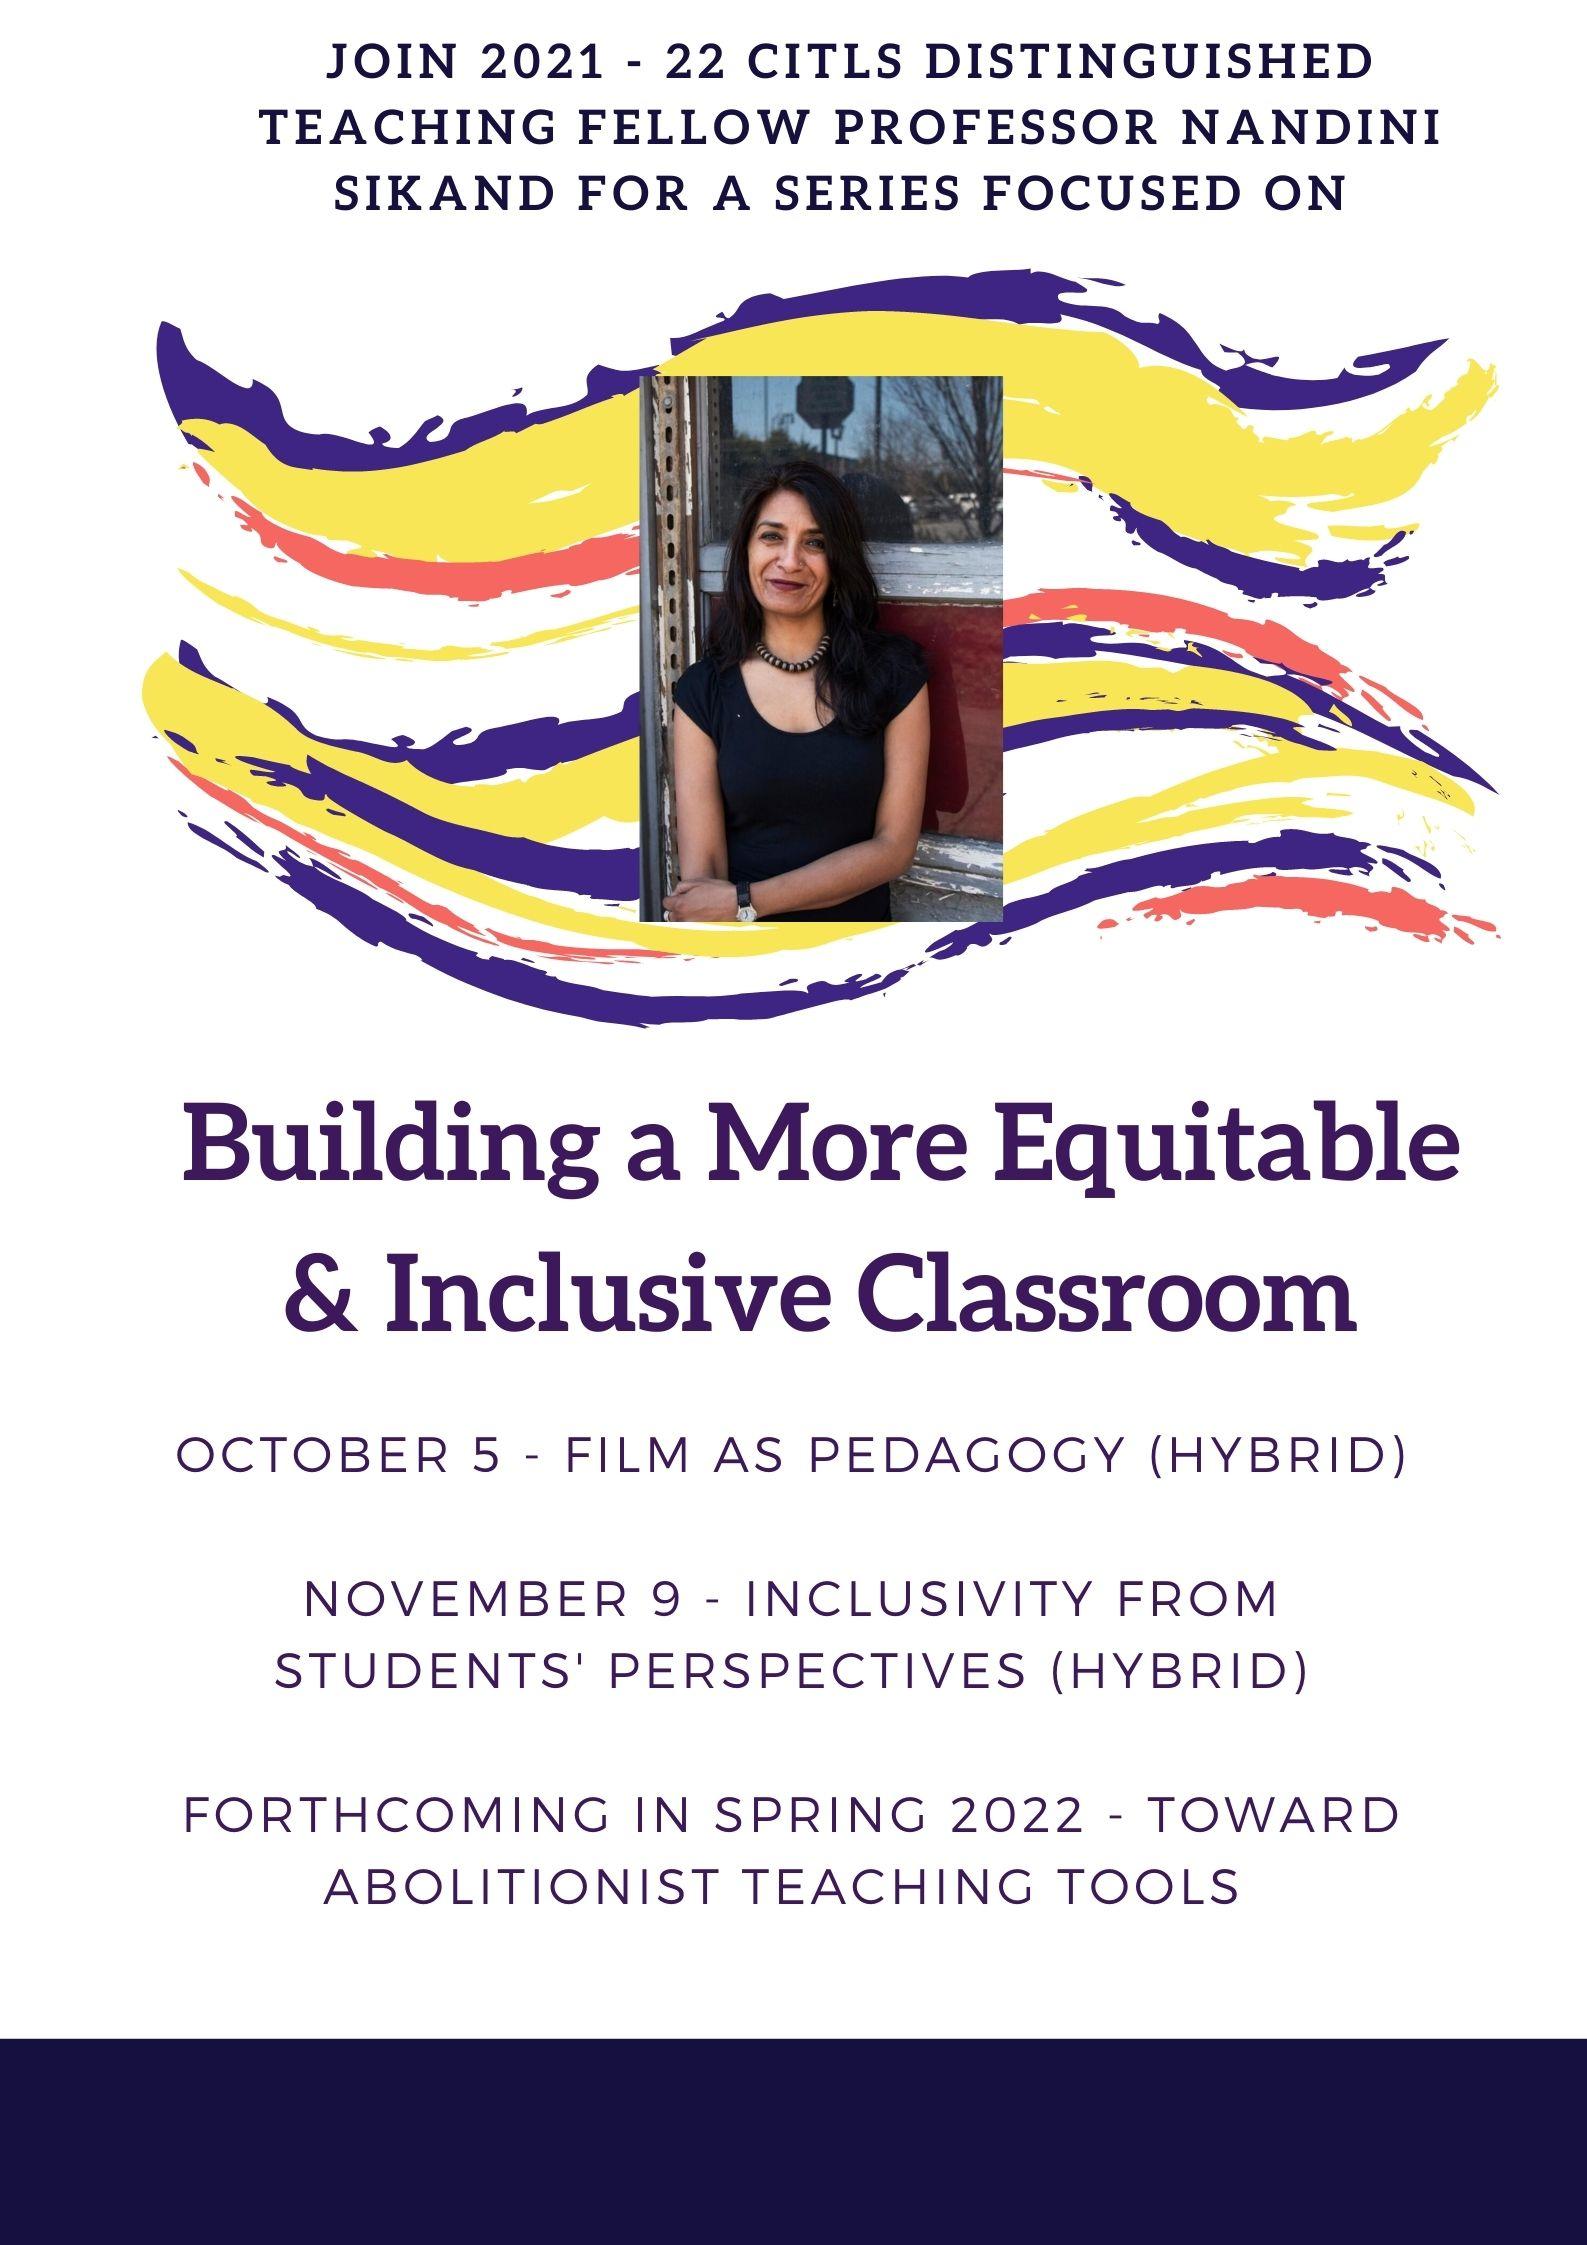 Inclusive Classrooms Series 2021-22